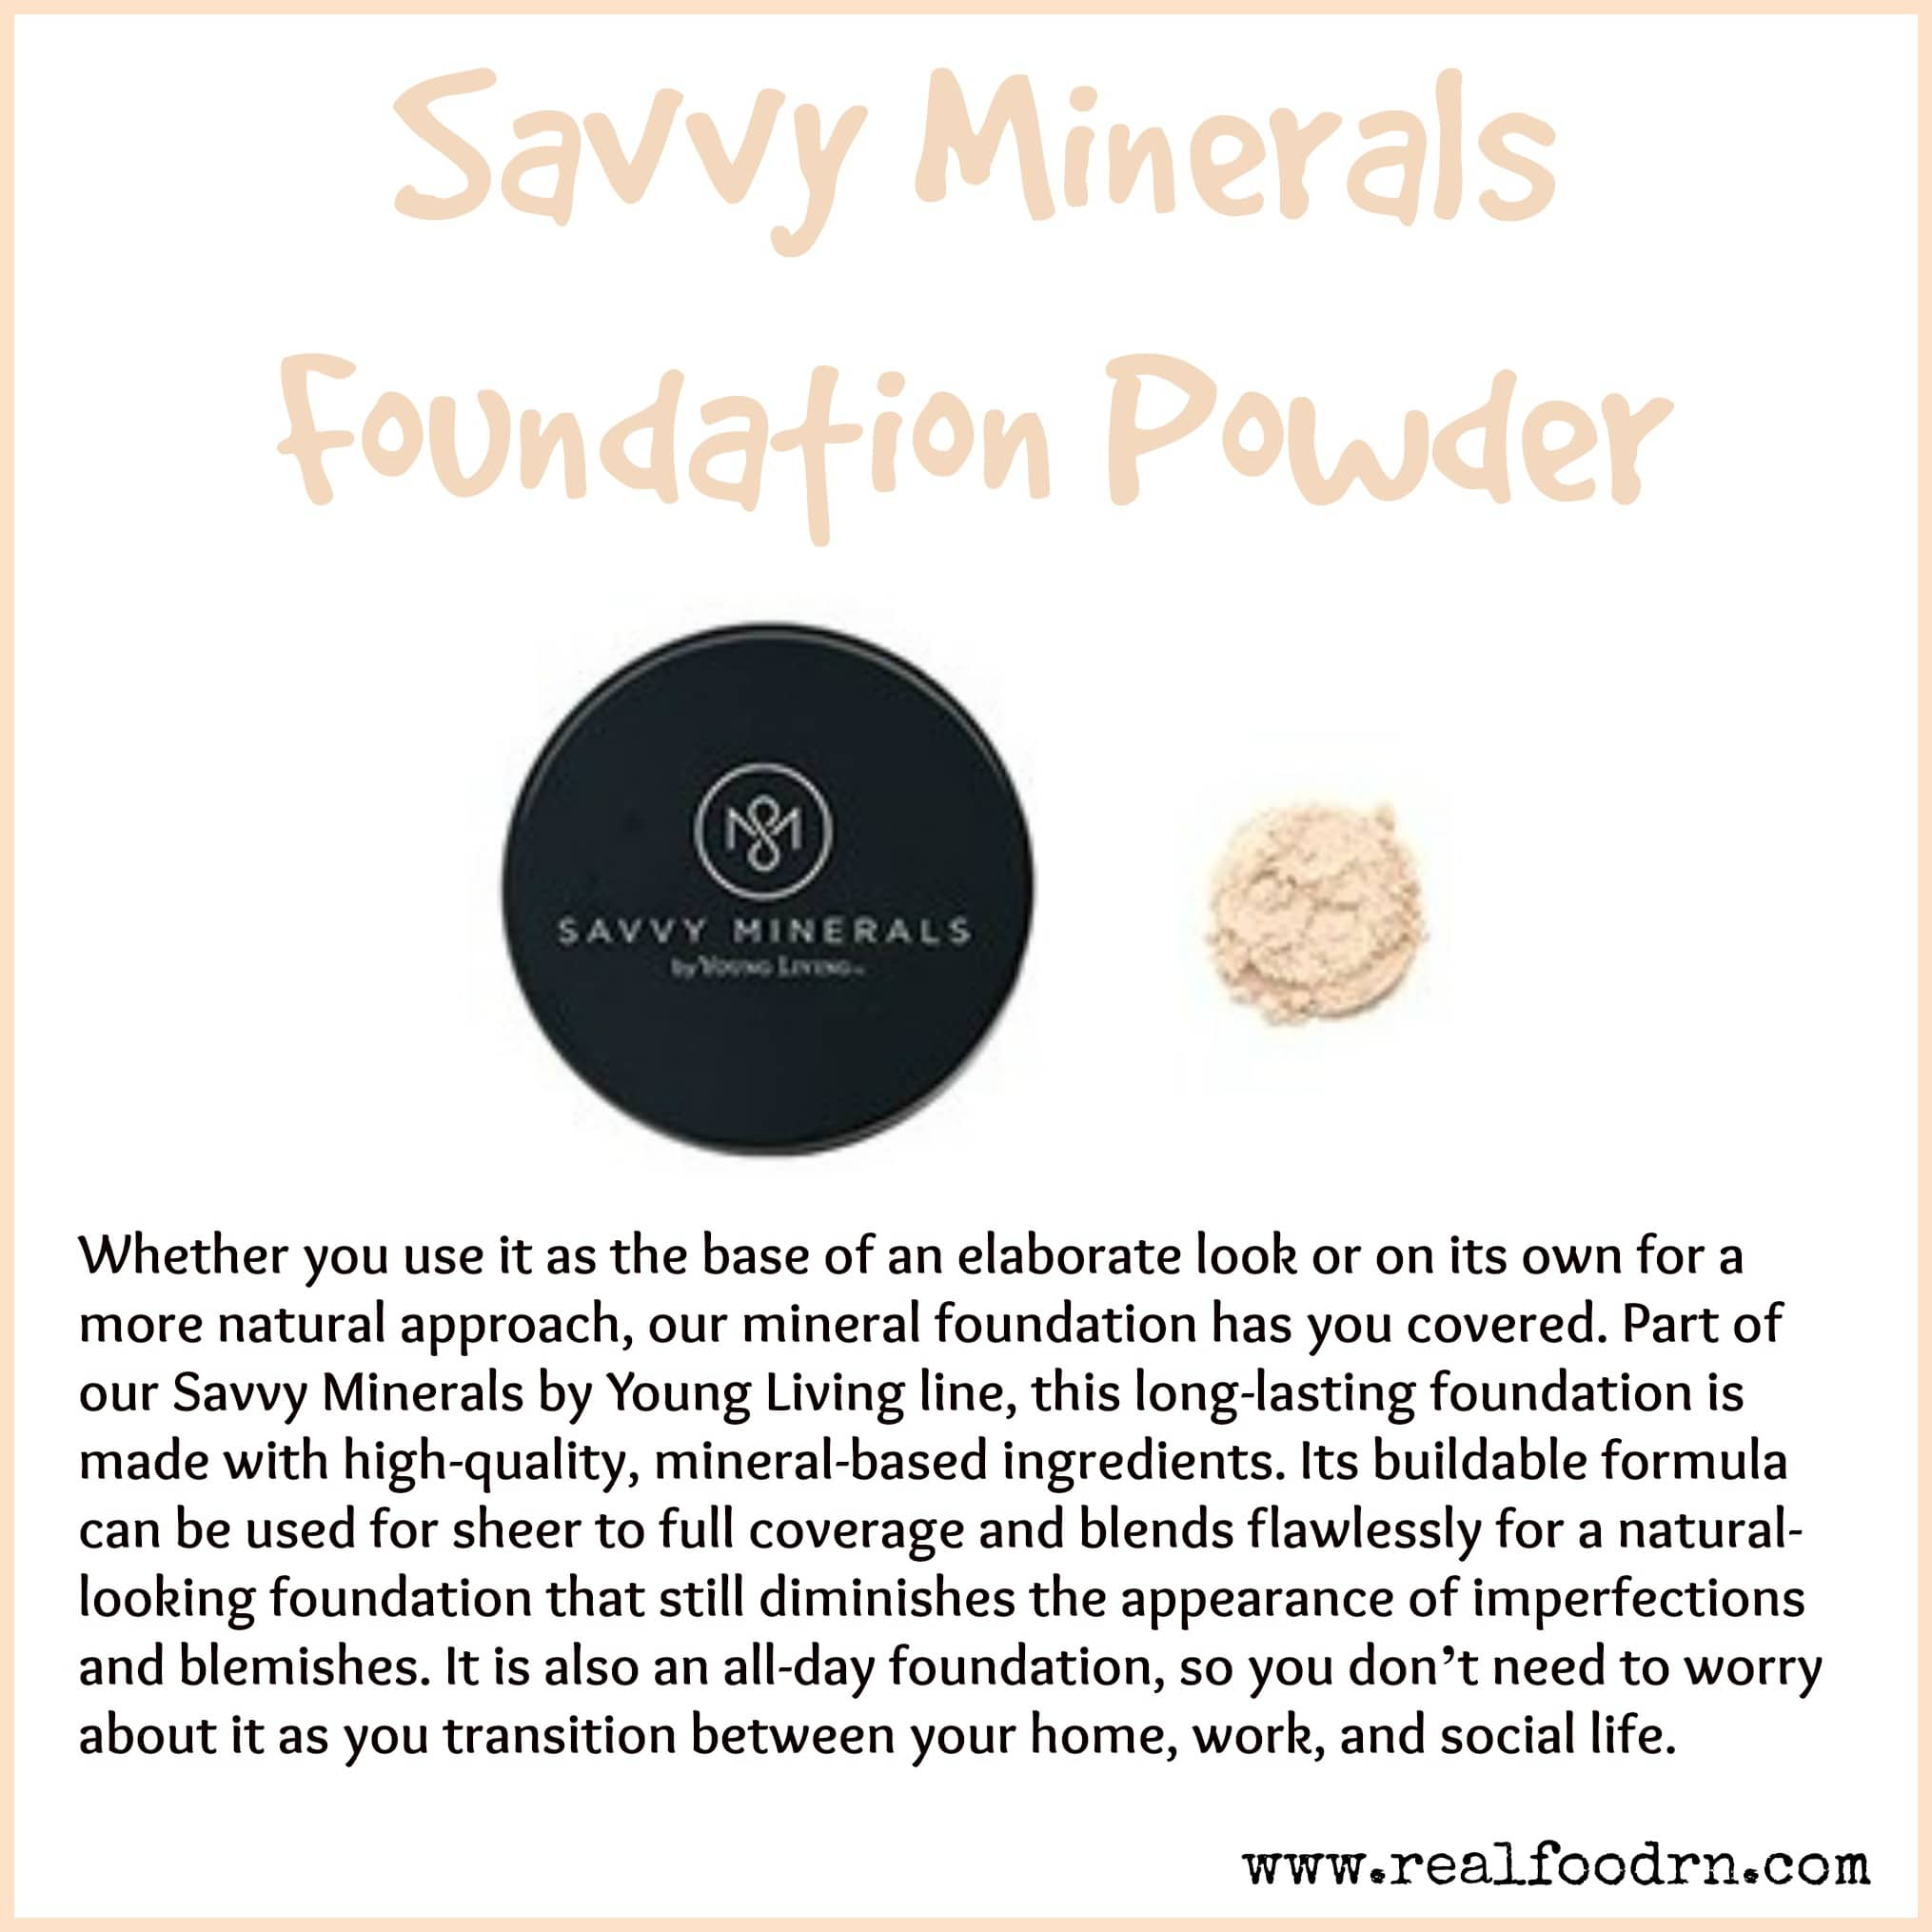 Savvy Minerals Foundation Powder